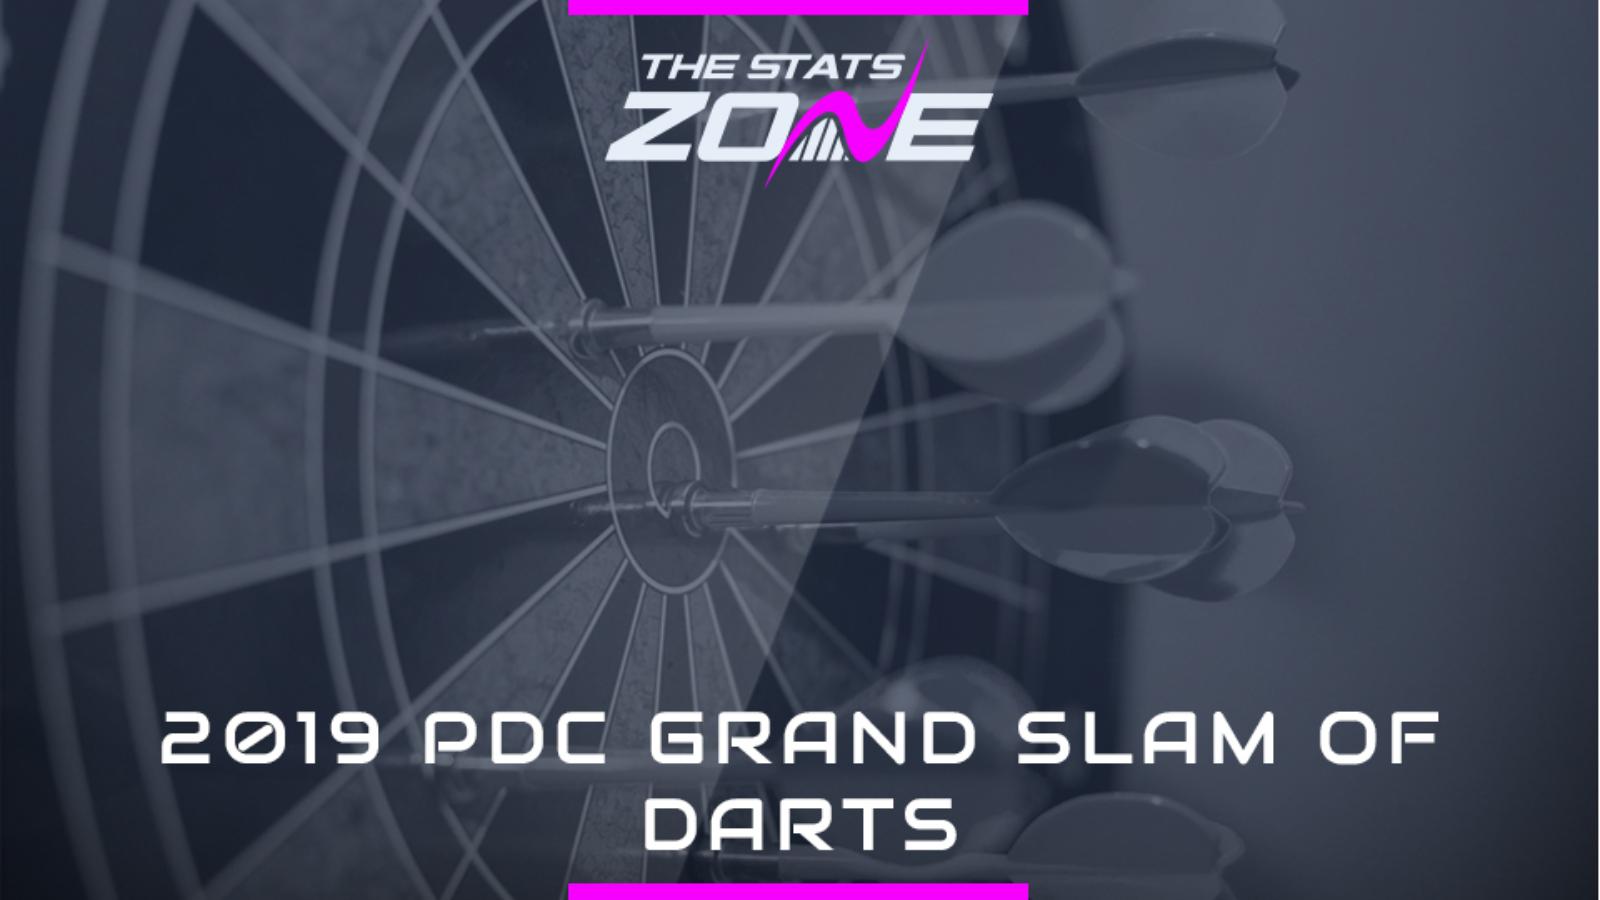 grand slam of darts 2019